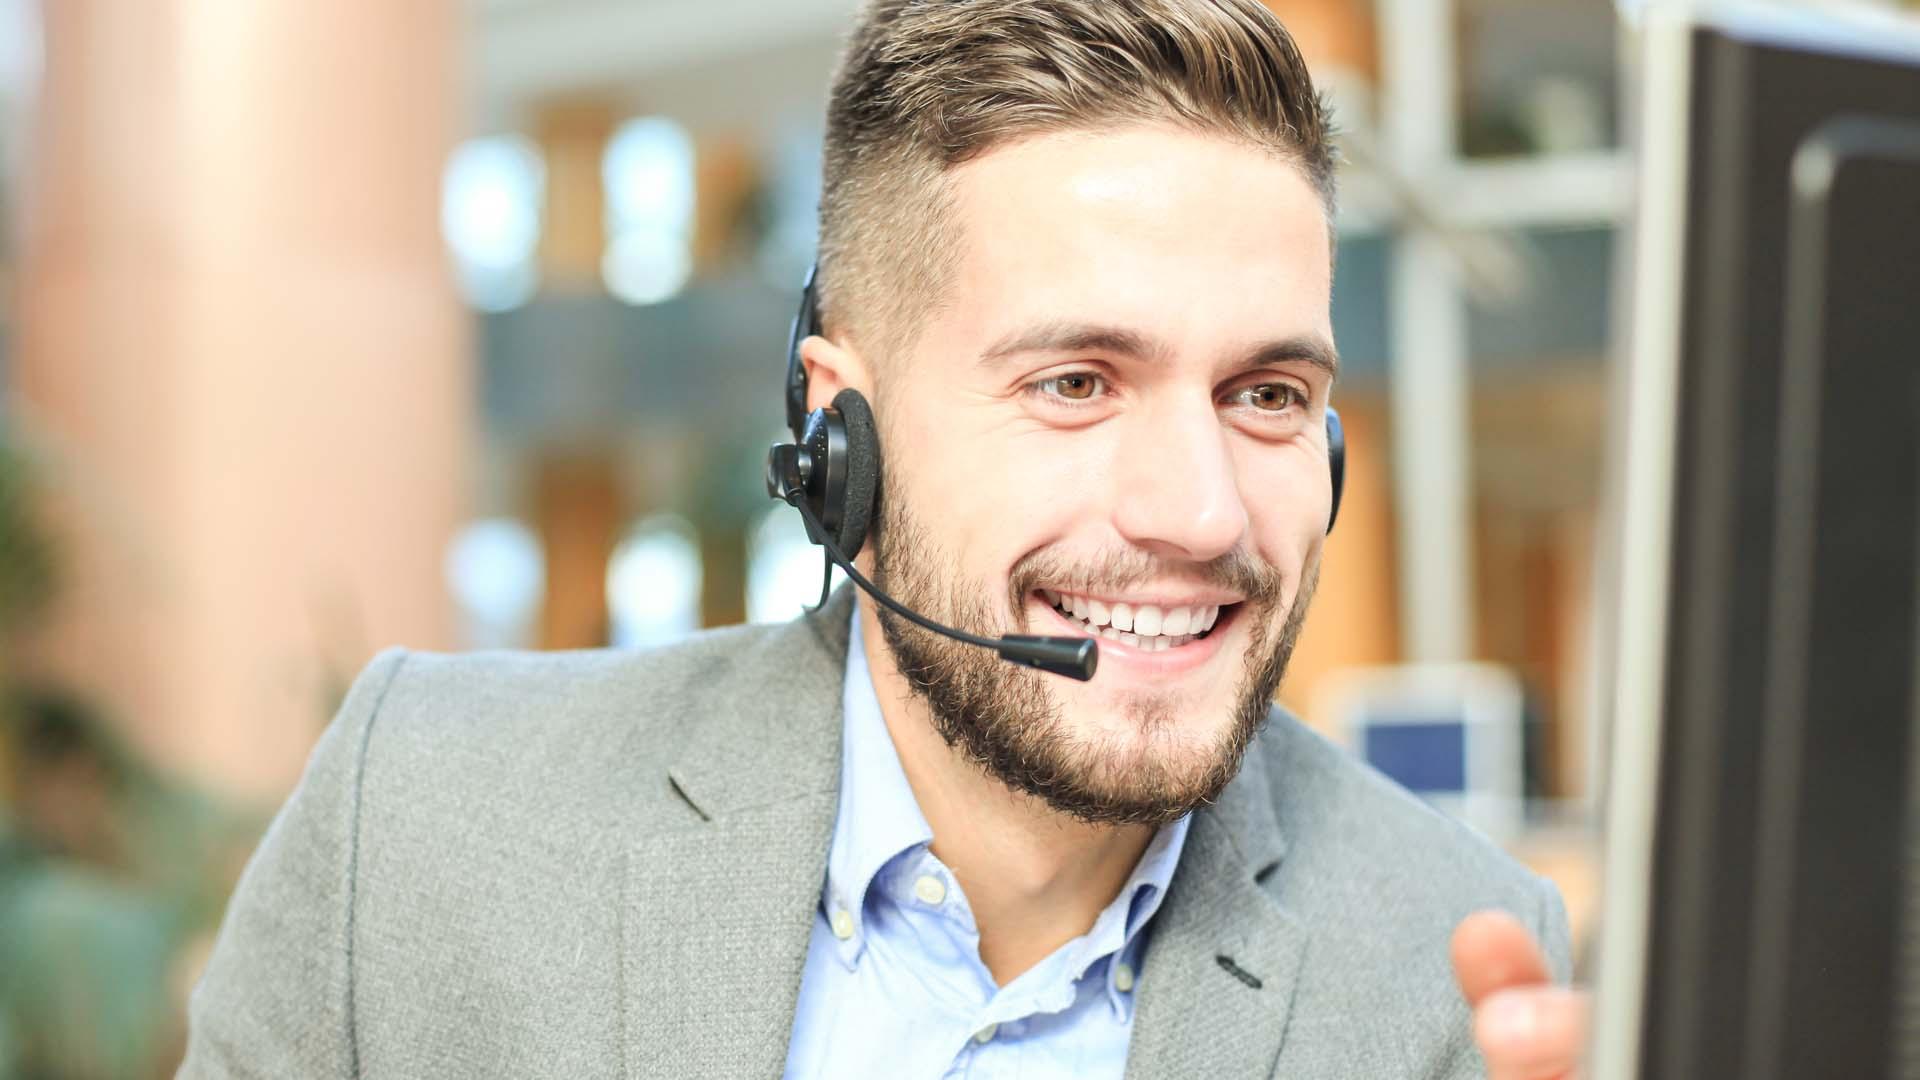 Produktberatung-kwickpick-Kundenbetreuung